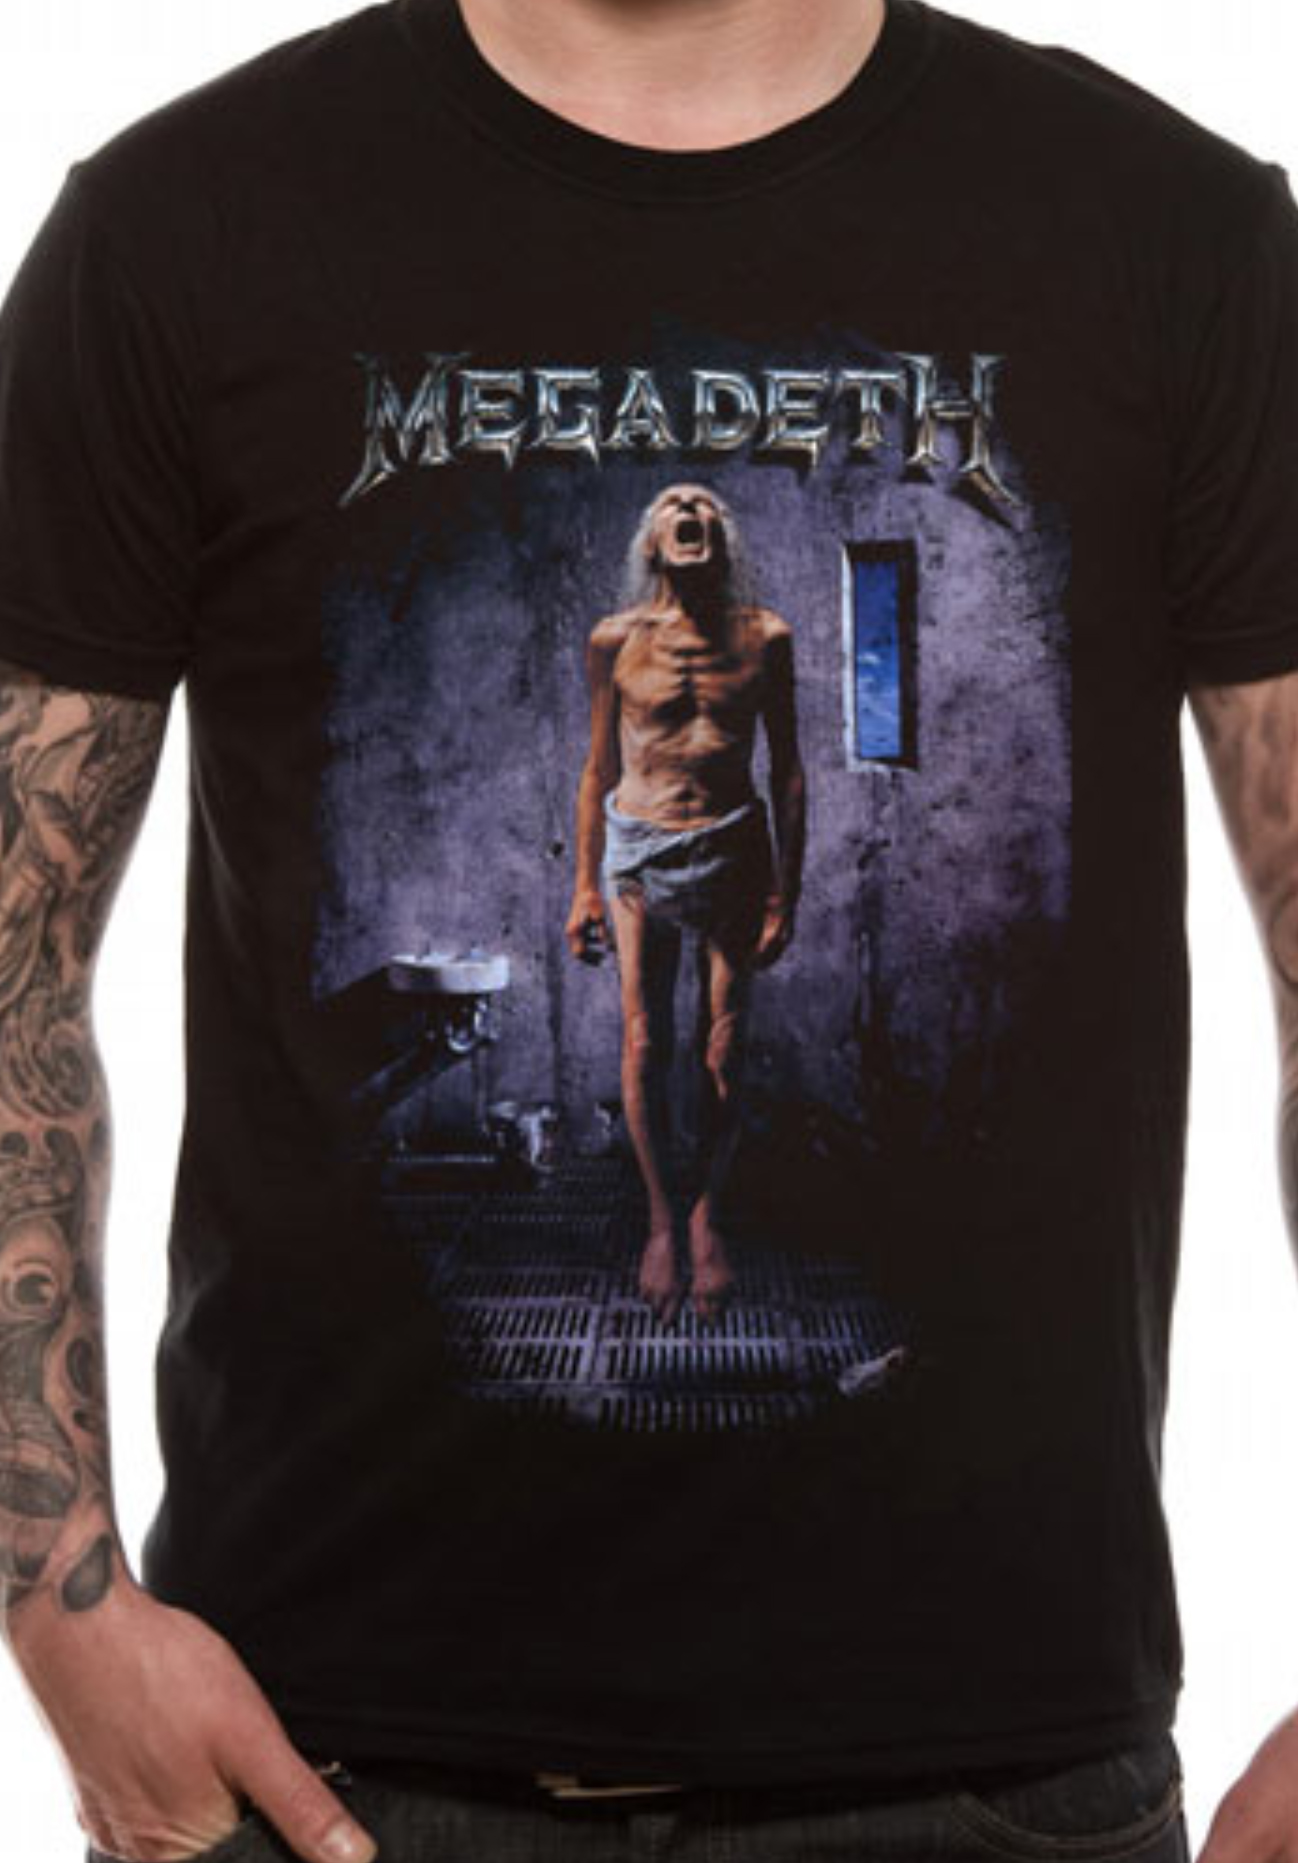 aaaaf4fd2 Megadeth Countdown to Extinction Heavy Thrash Metal Rock Official Tee T- Shirt